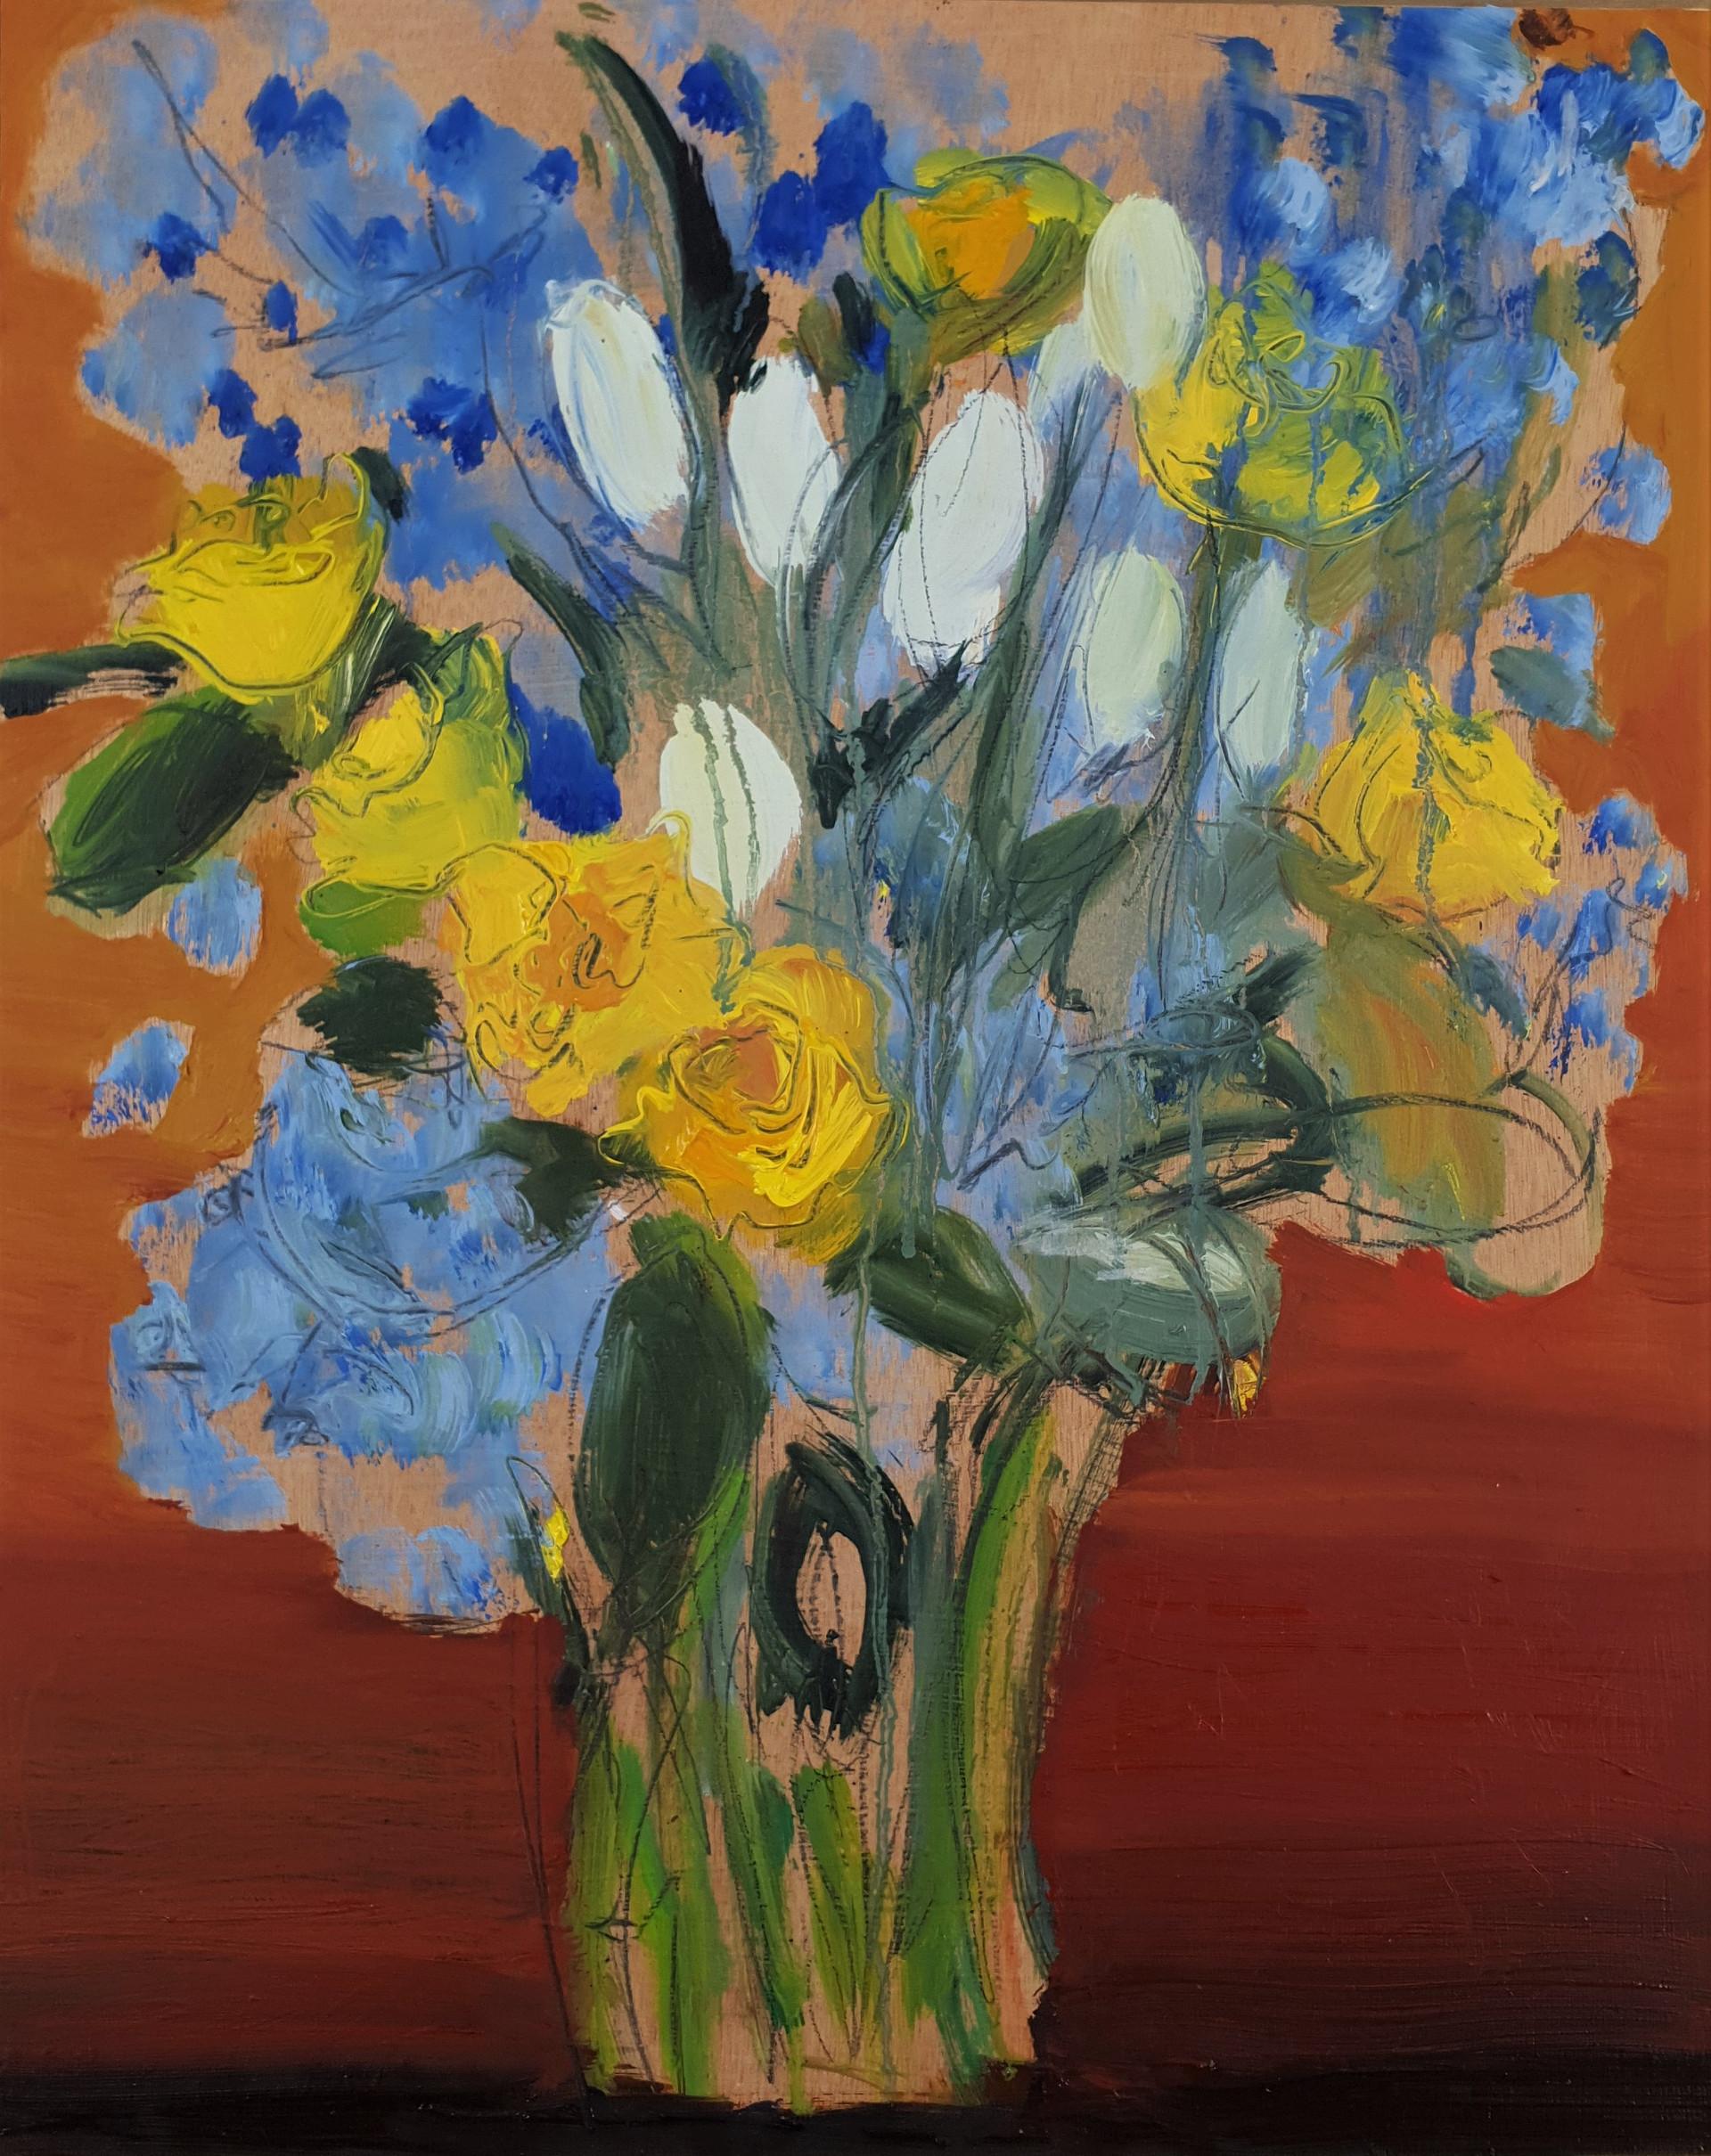 12. Daffodils in Spring